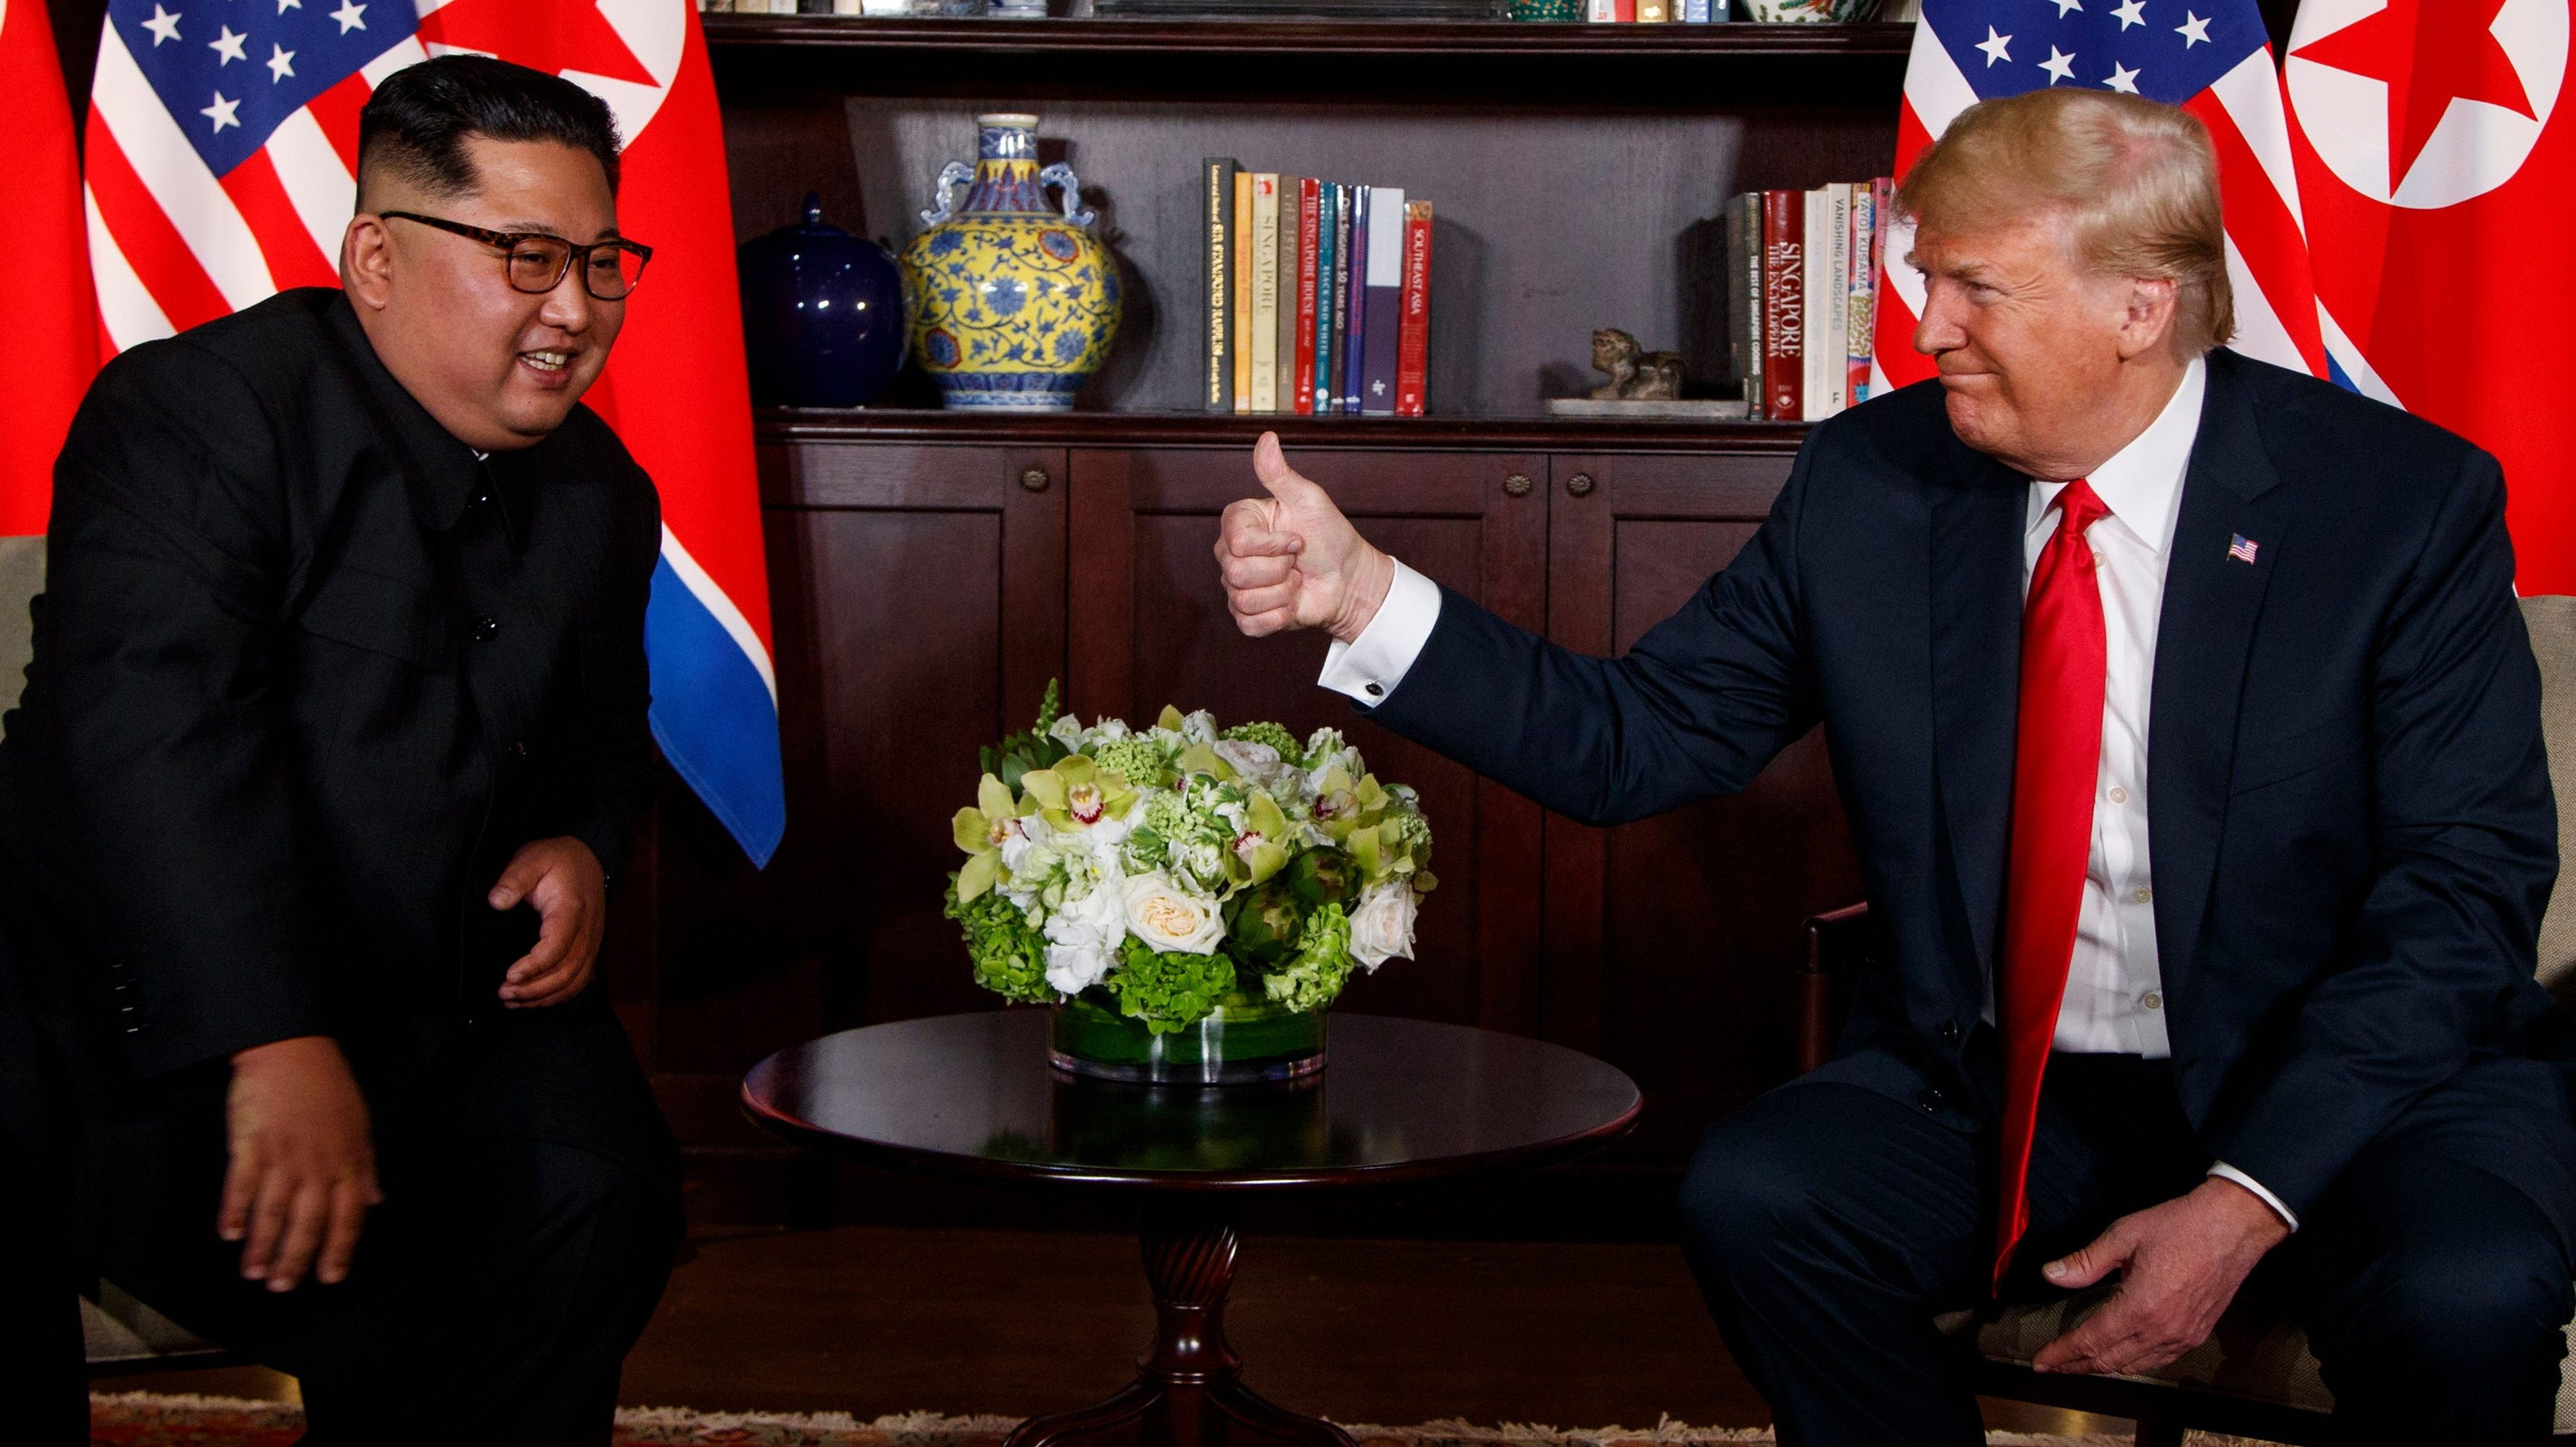 Donald Trump and Kim Jong Un at US-North Korea summit.